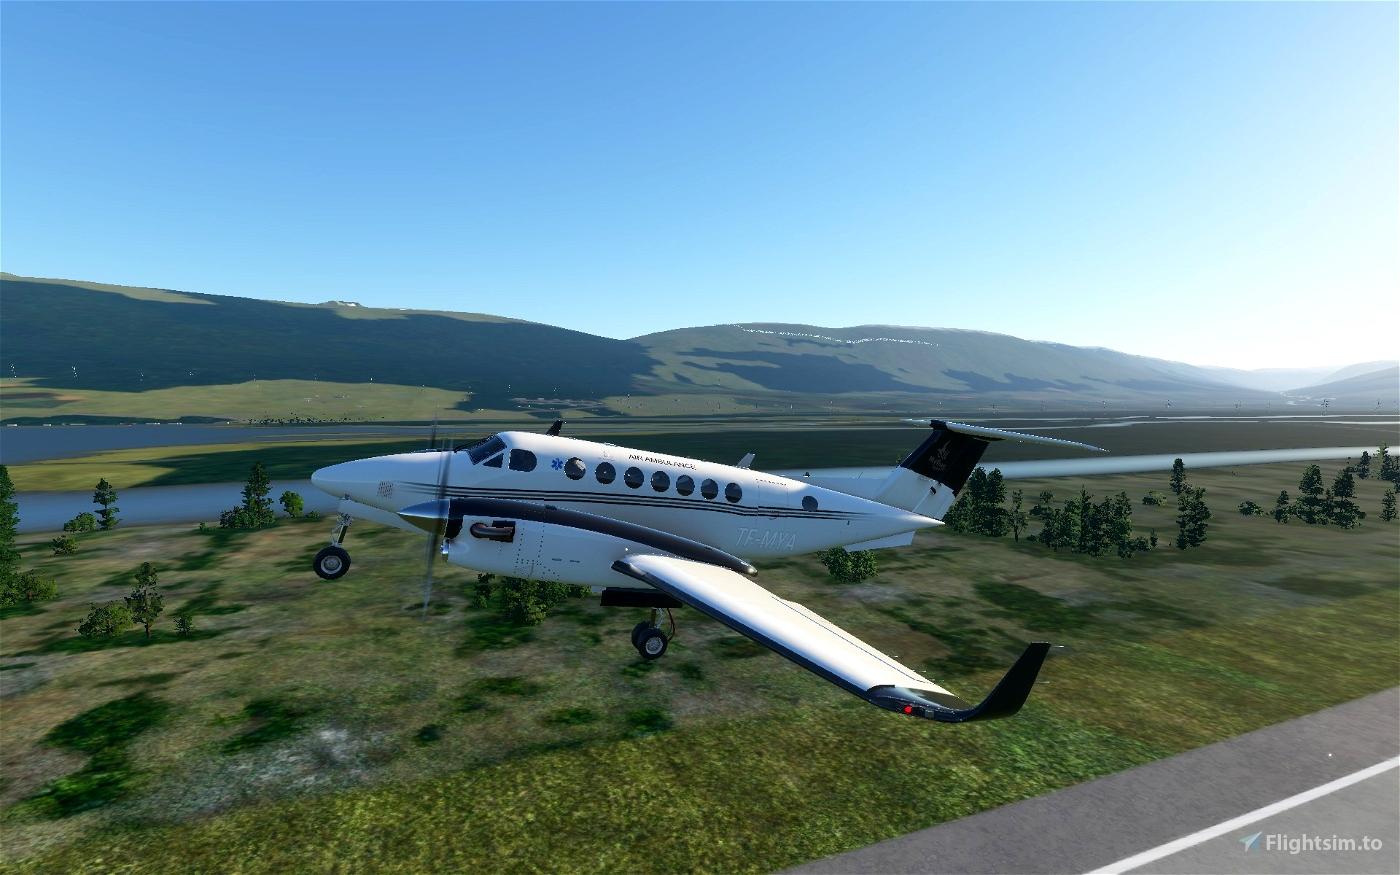 Beechcraft 350 Mýflug Air Ambulance TF-MYA Flight Simulator 2020